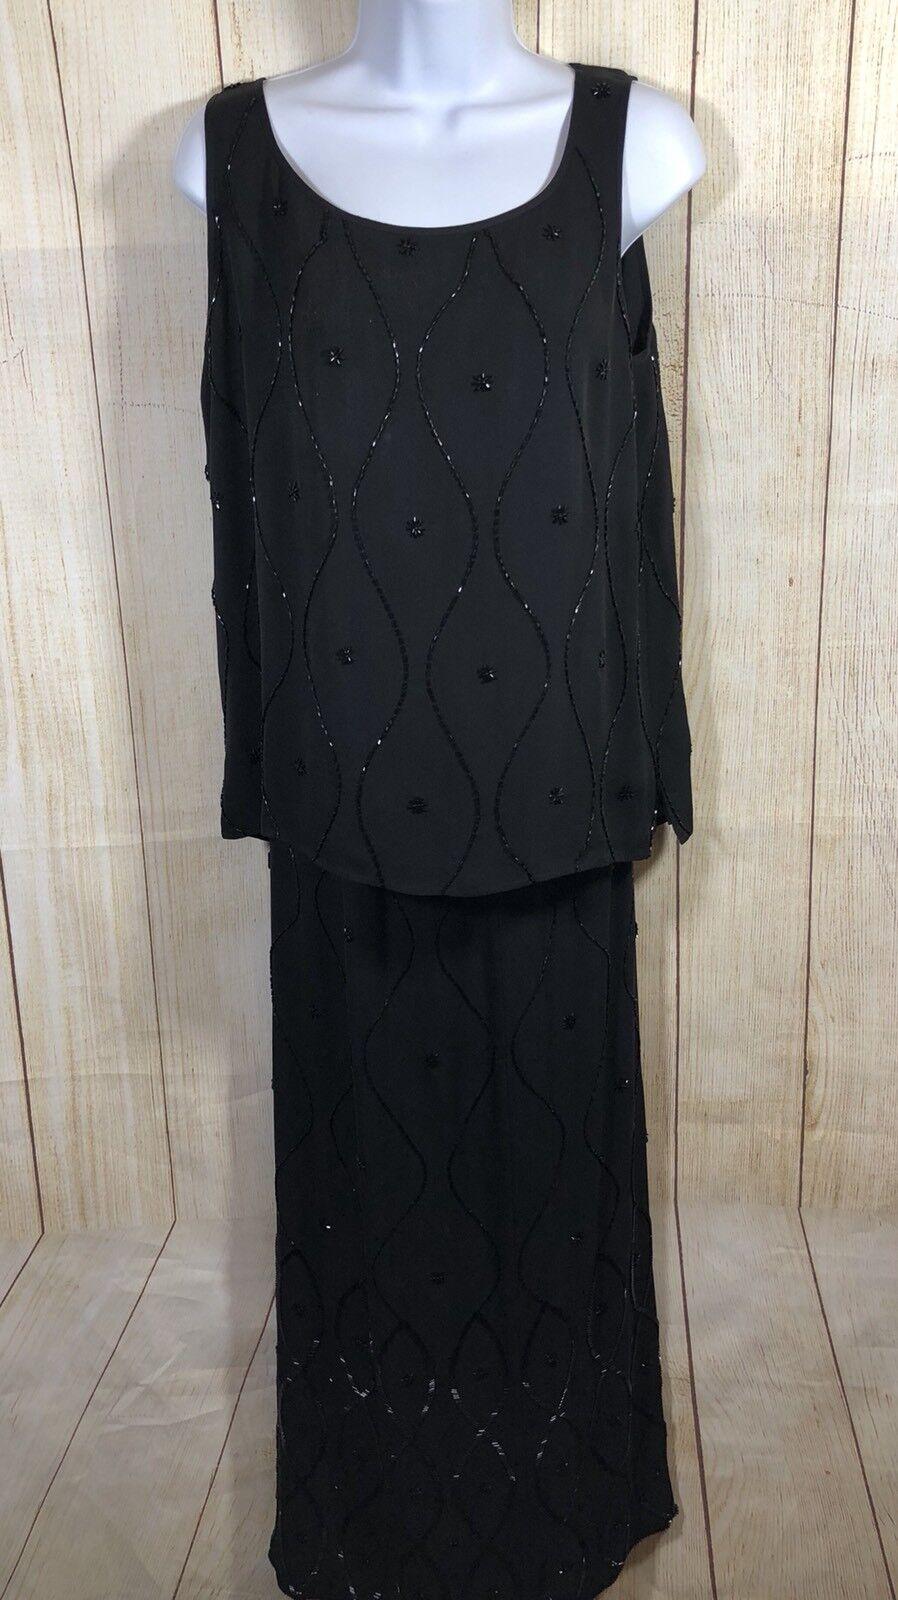 DONCASTER NWT 100% Silk schwarz 3 Piece Beaded Evening Dressy Ensemble Größe 8